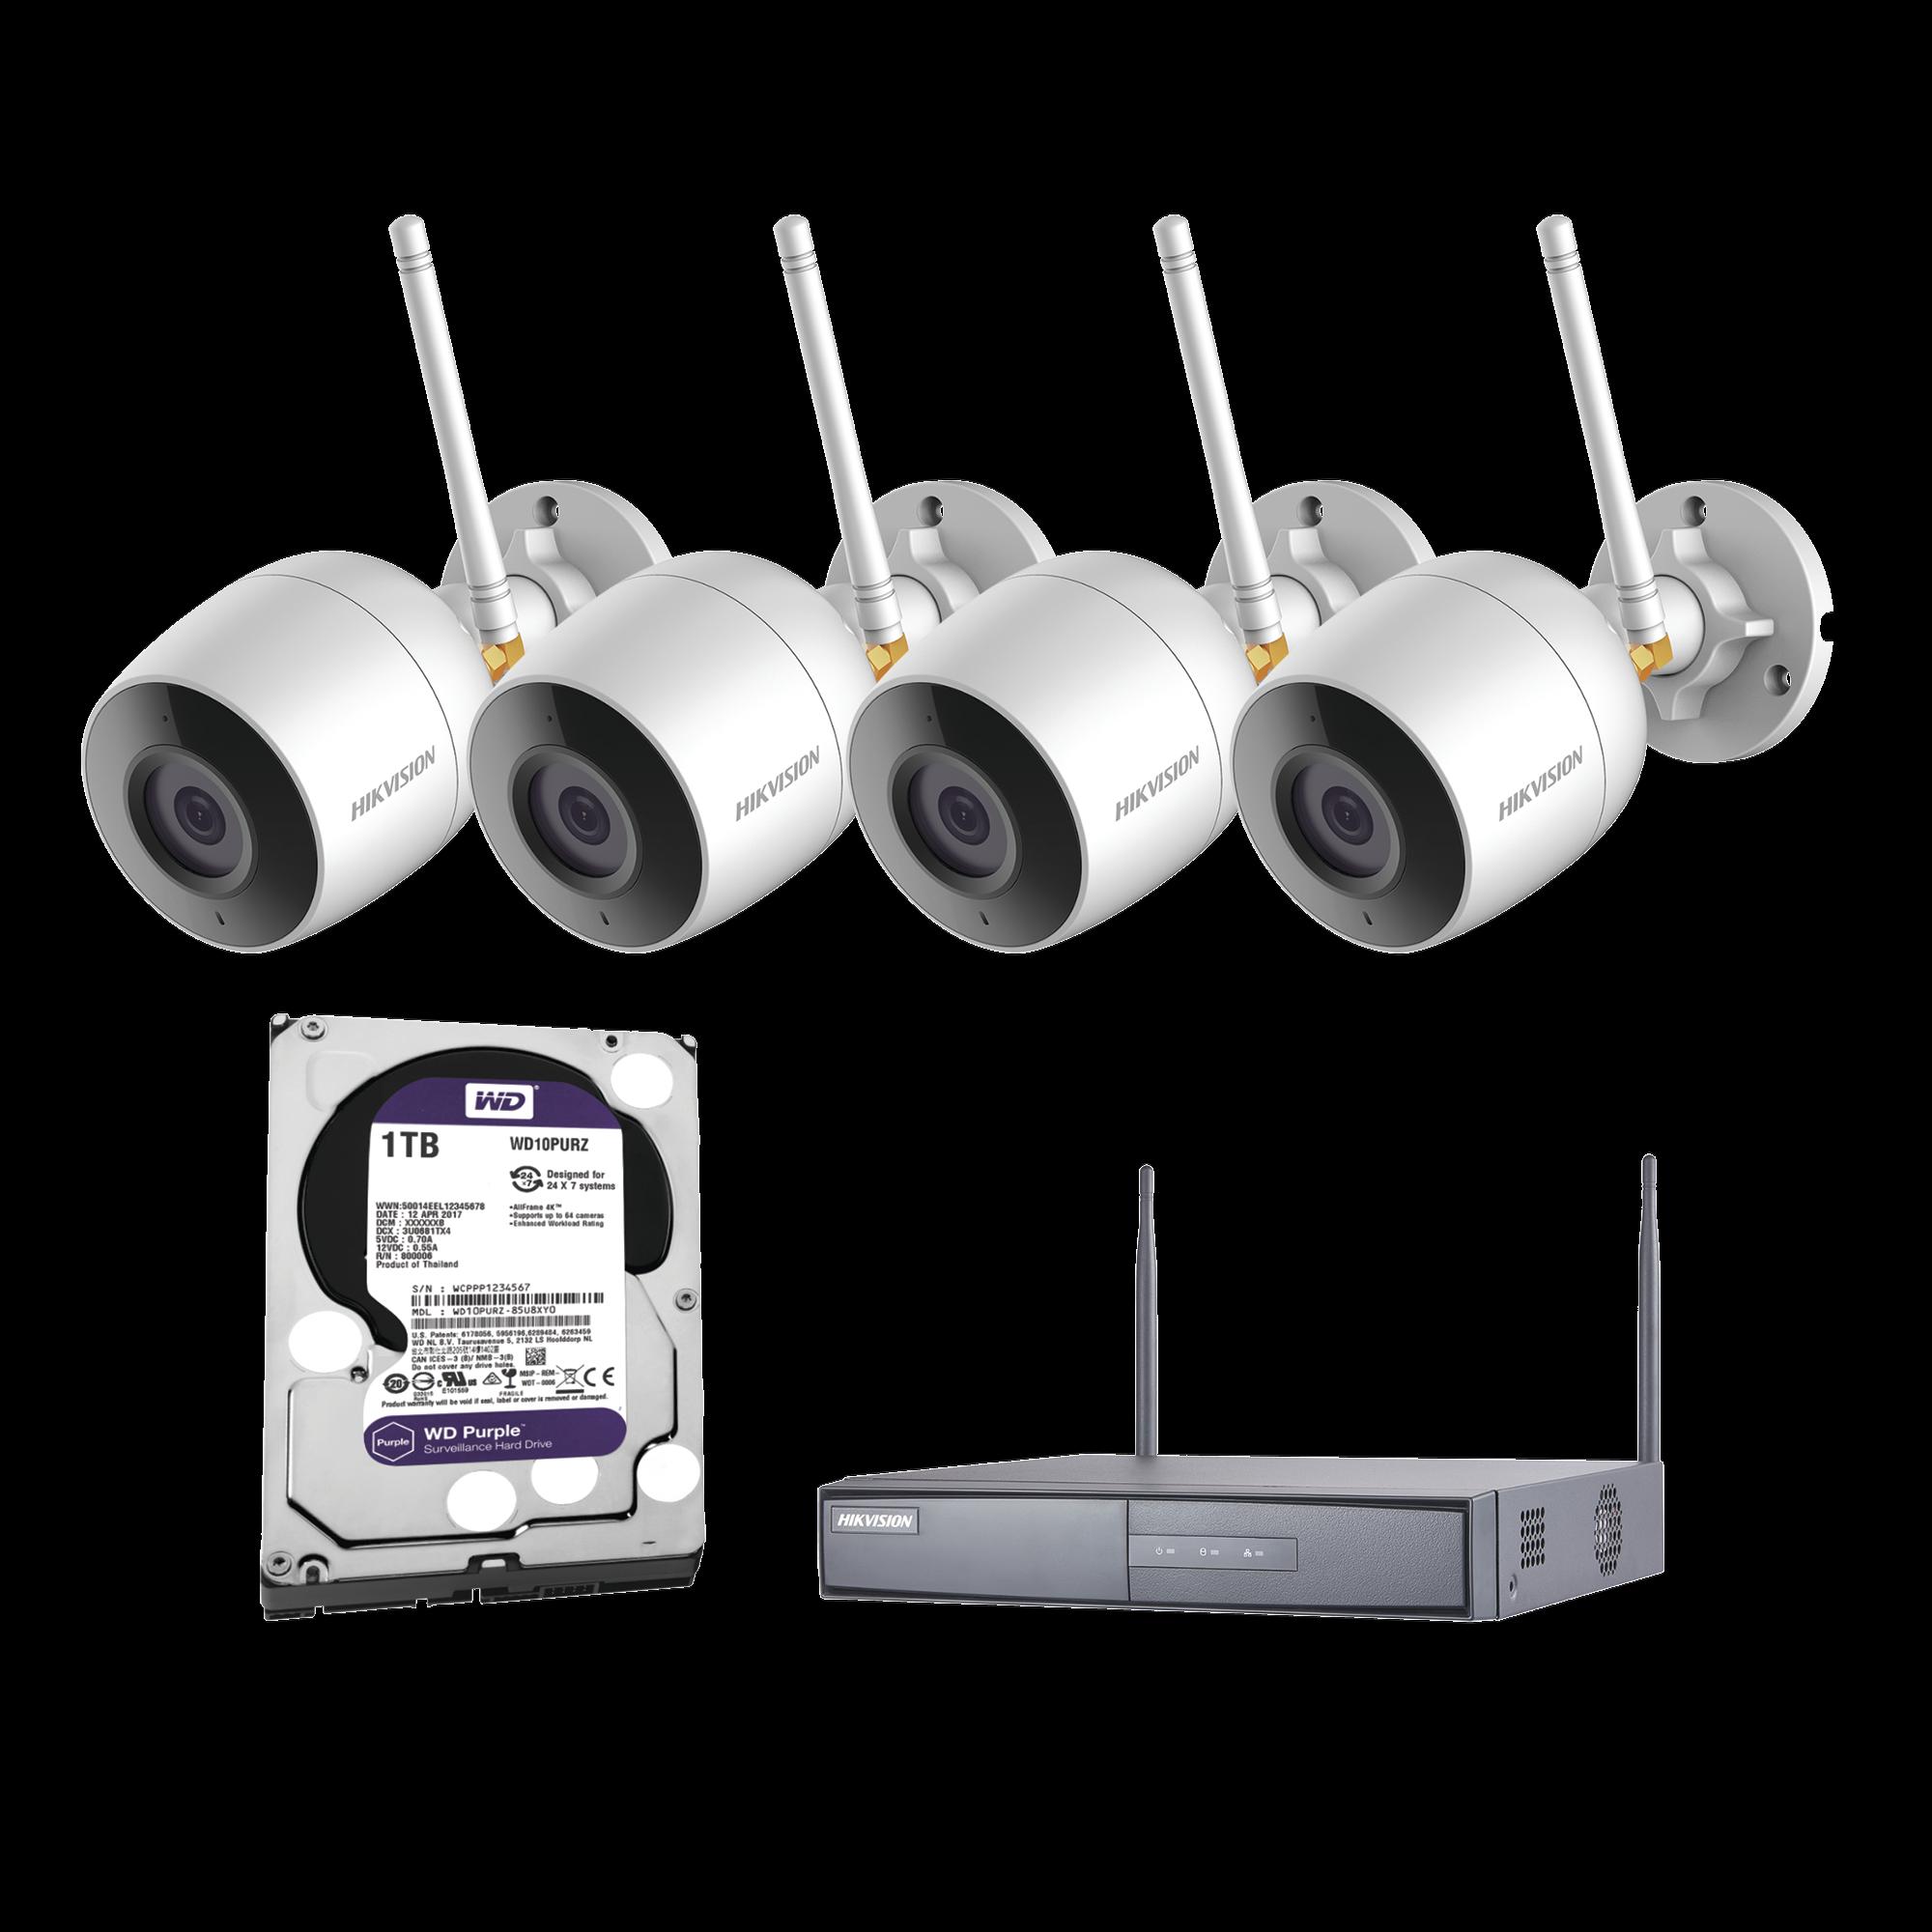 Sistema IP Inalambrico 1080p / NVR 4 canales / 4 cámaras bala (exterior IP66) con microfono interconstruido / Disco duro 1TB serie purpura